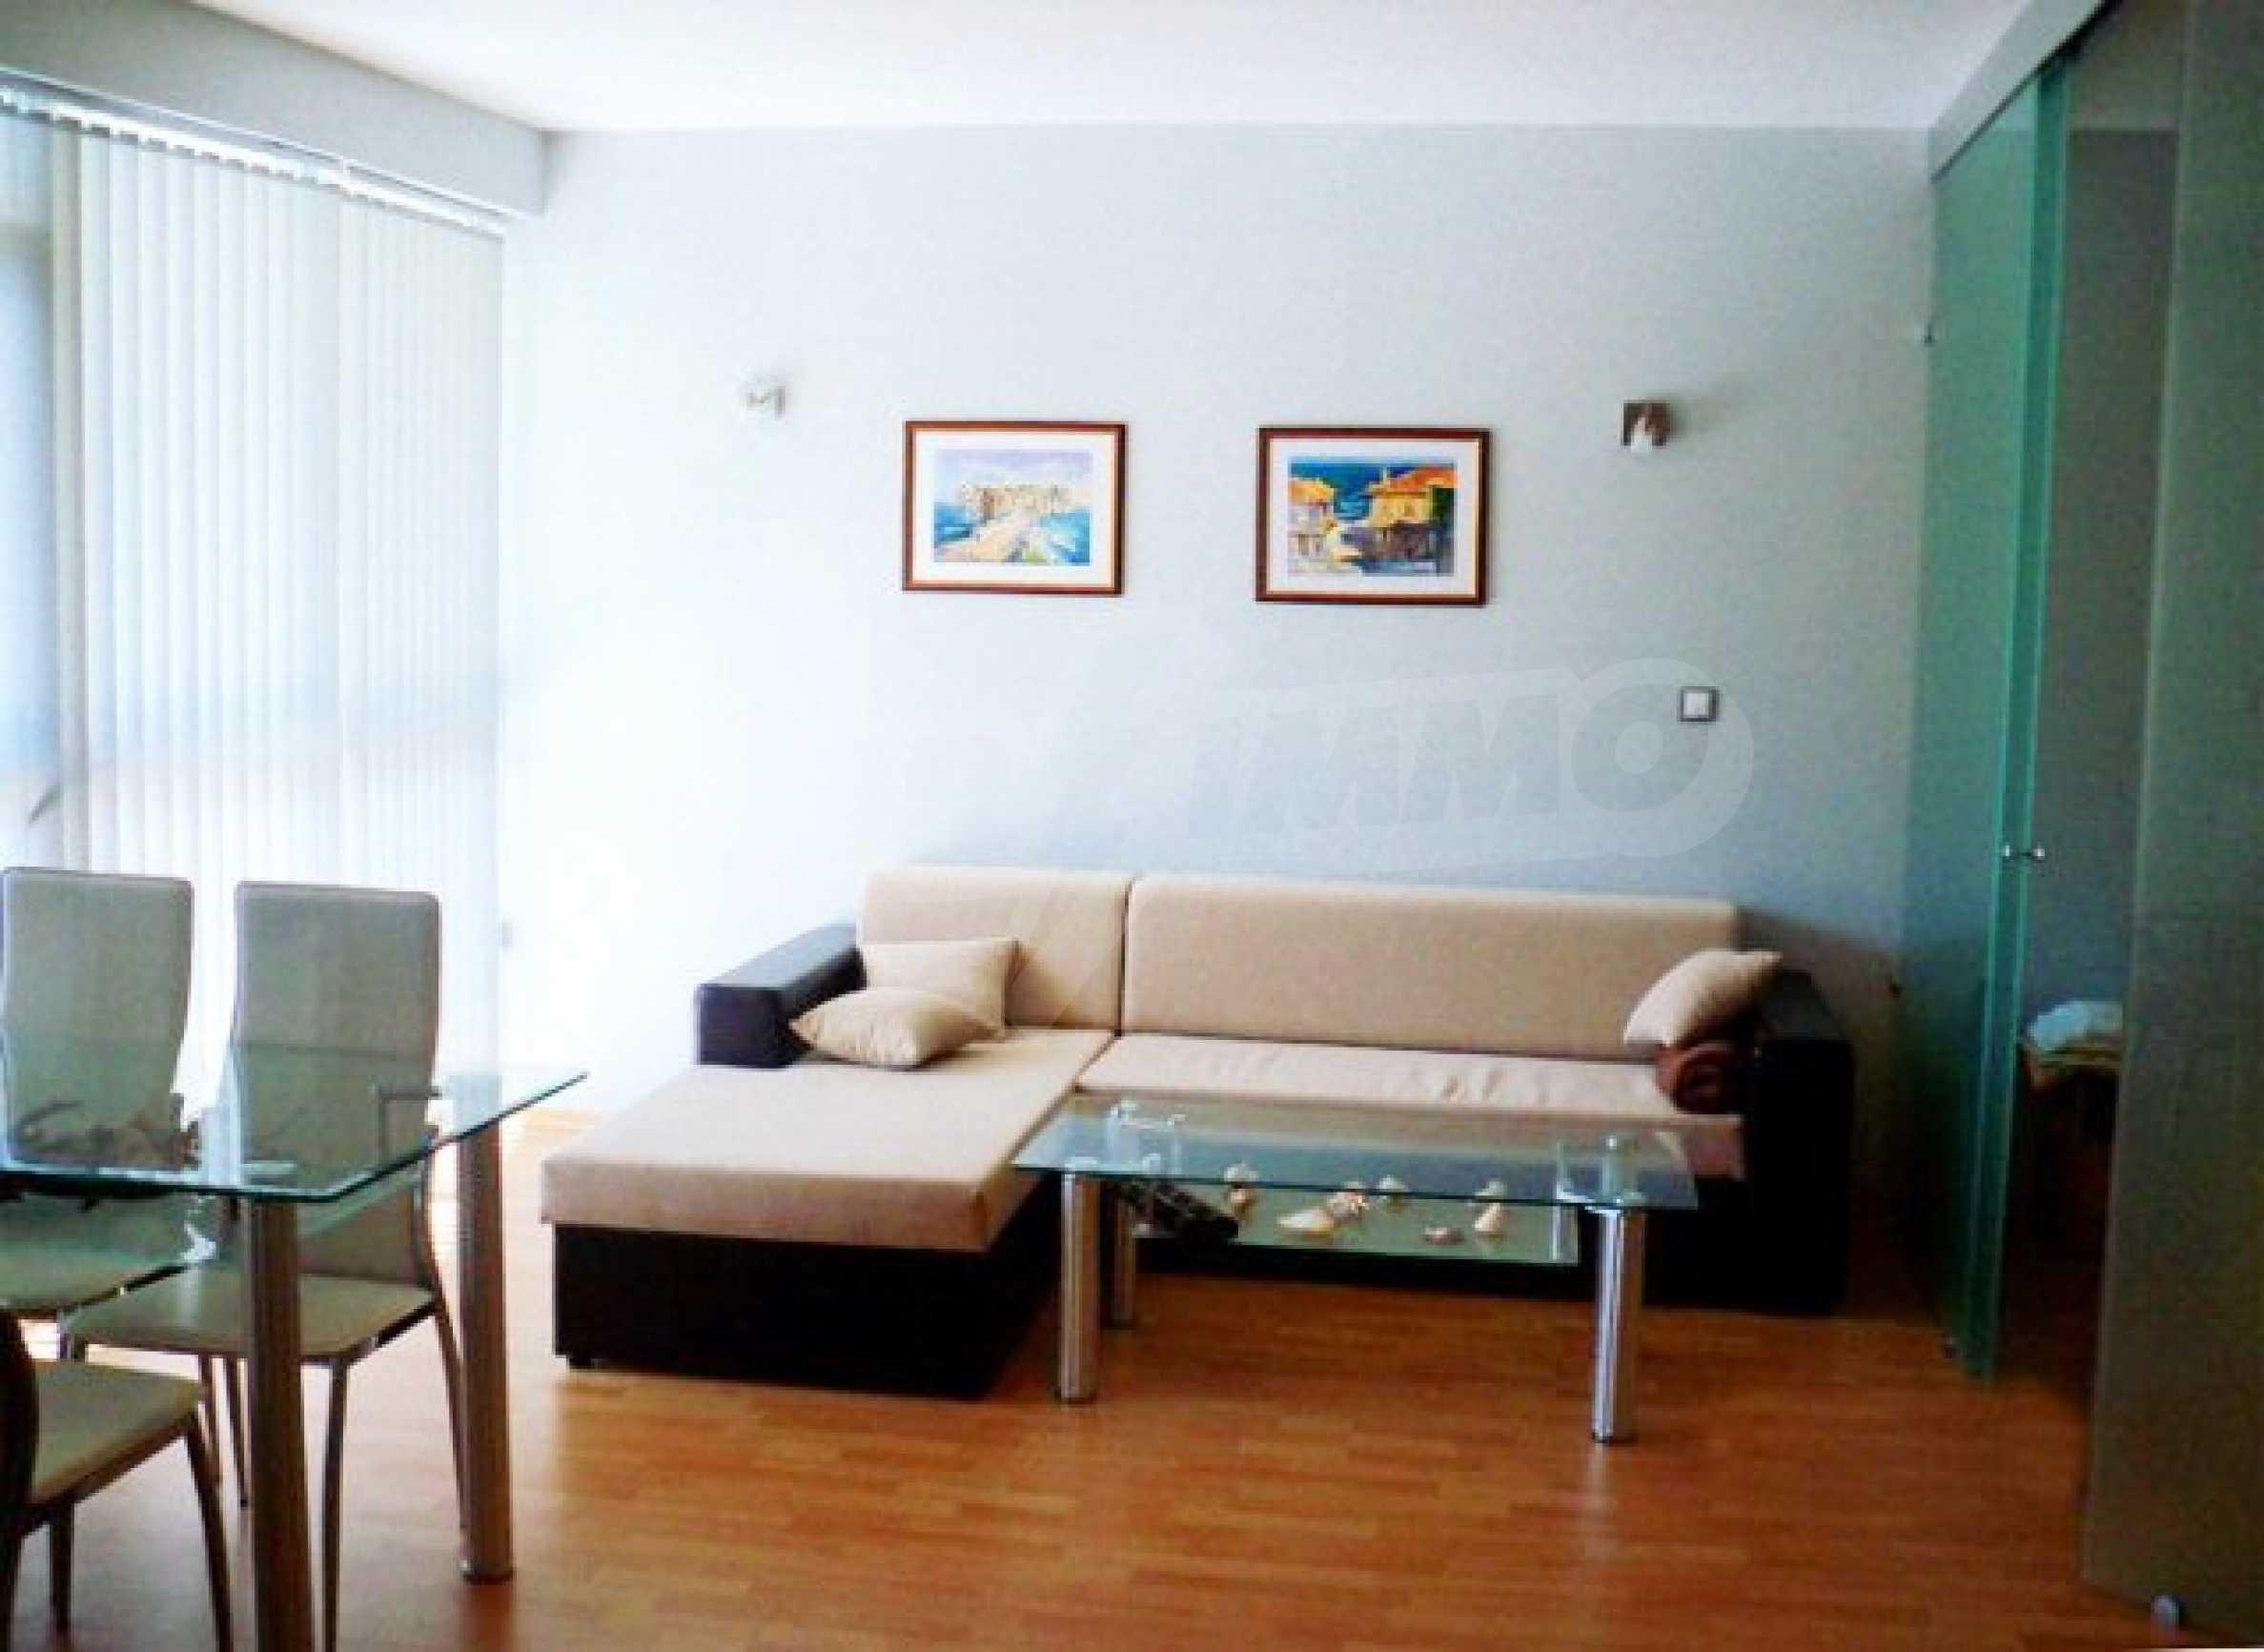 Тристаен апартамент за продажба в Поморие 11